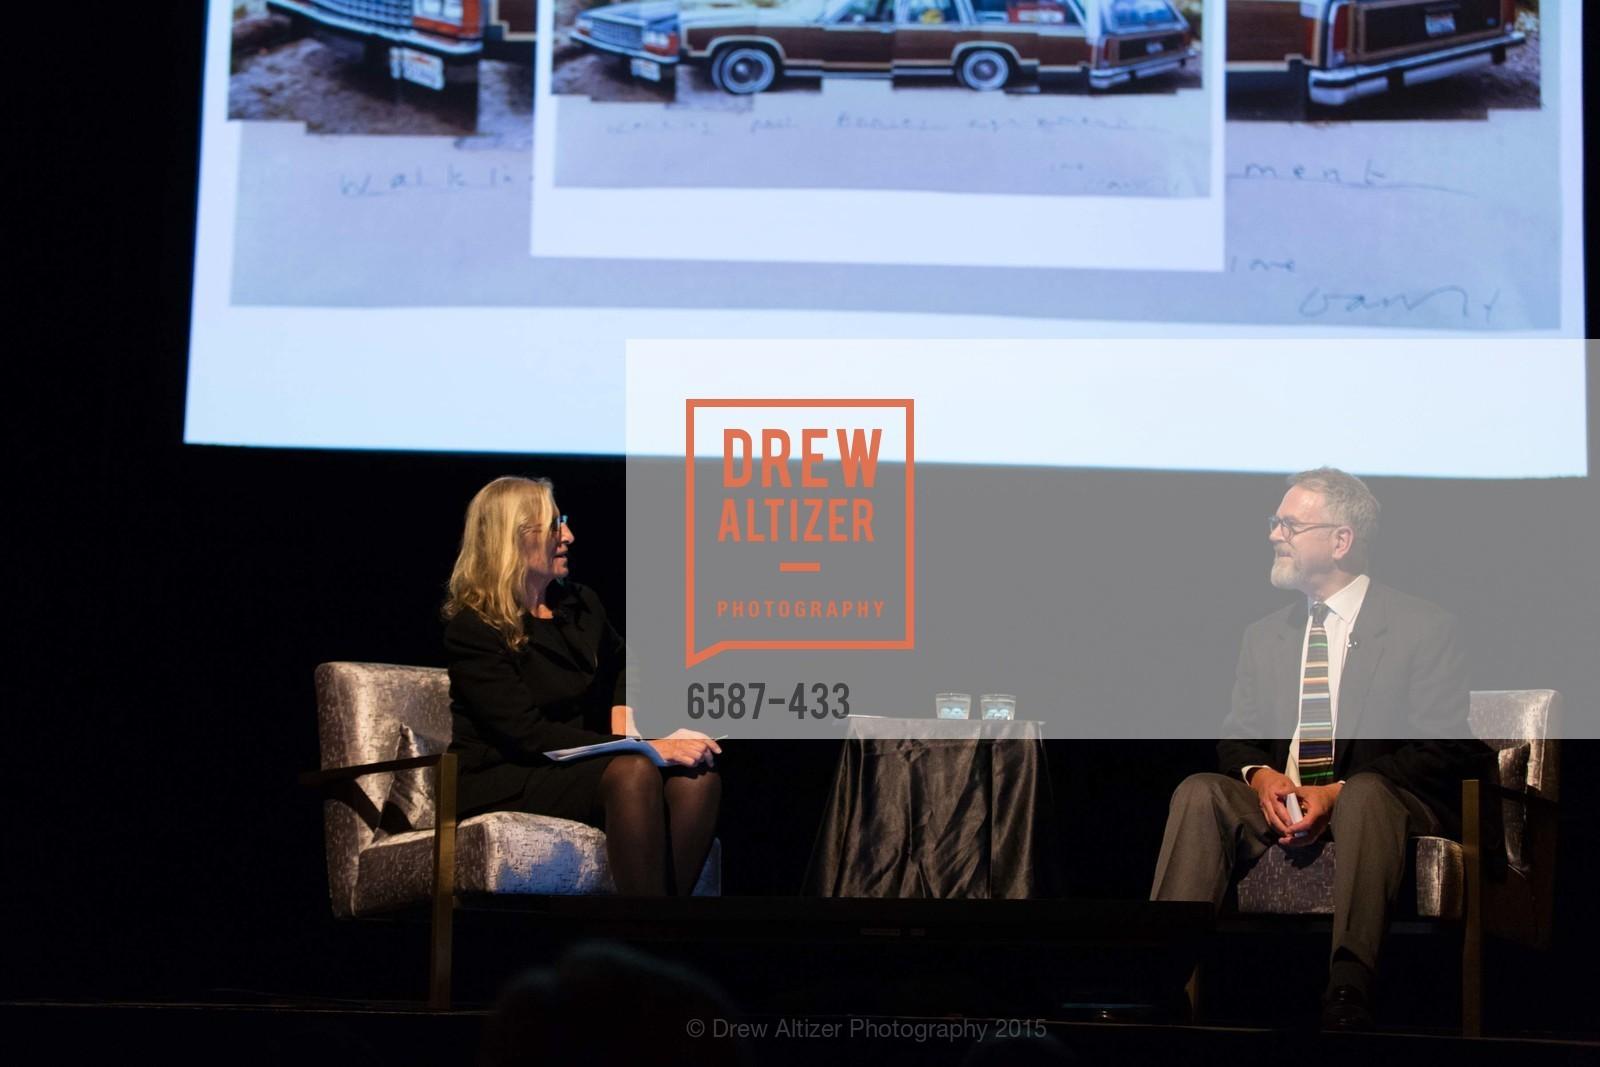 Annie Leibovitz, Nion McEvoy, SFMOMA Contemporary Vision Award, Regency Ballroom. 1300 Van Ness, November 3rd, 2015